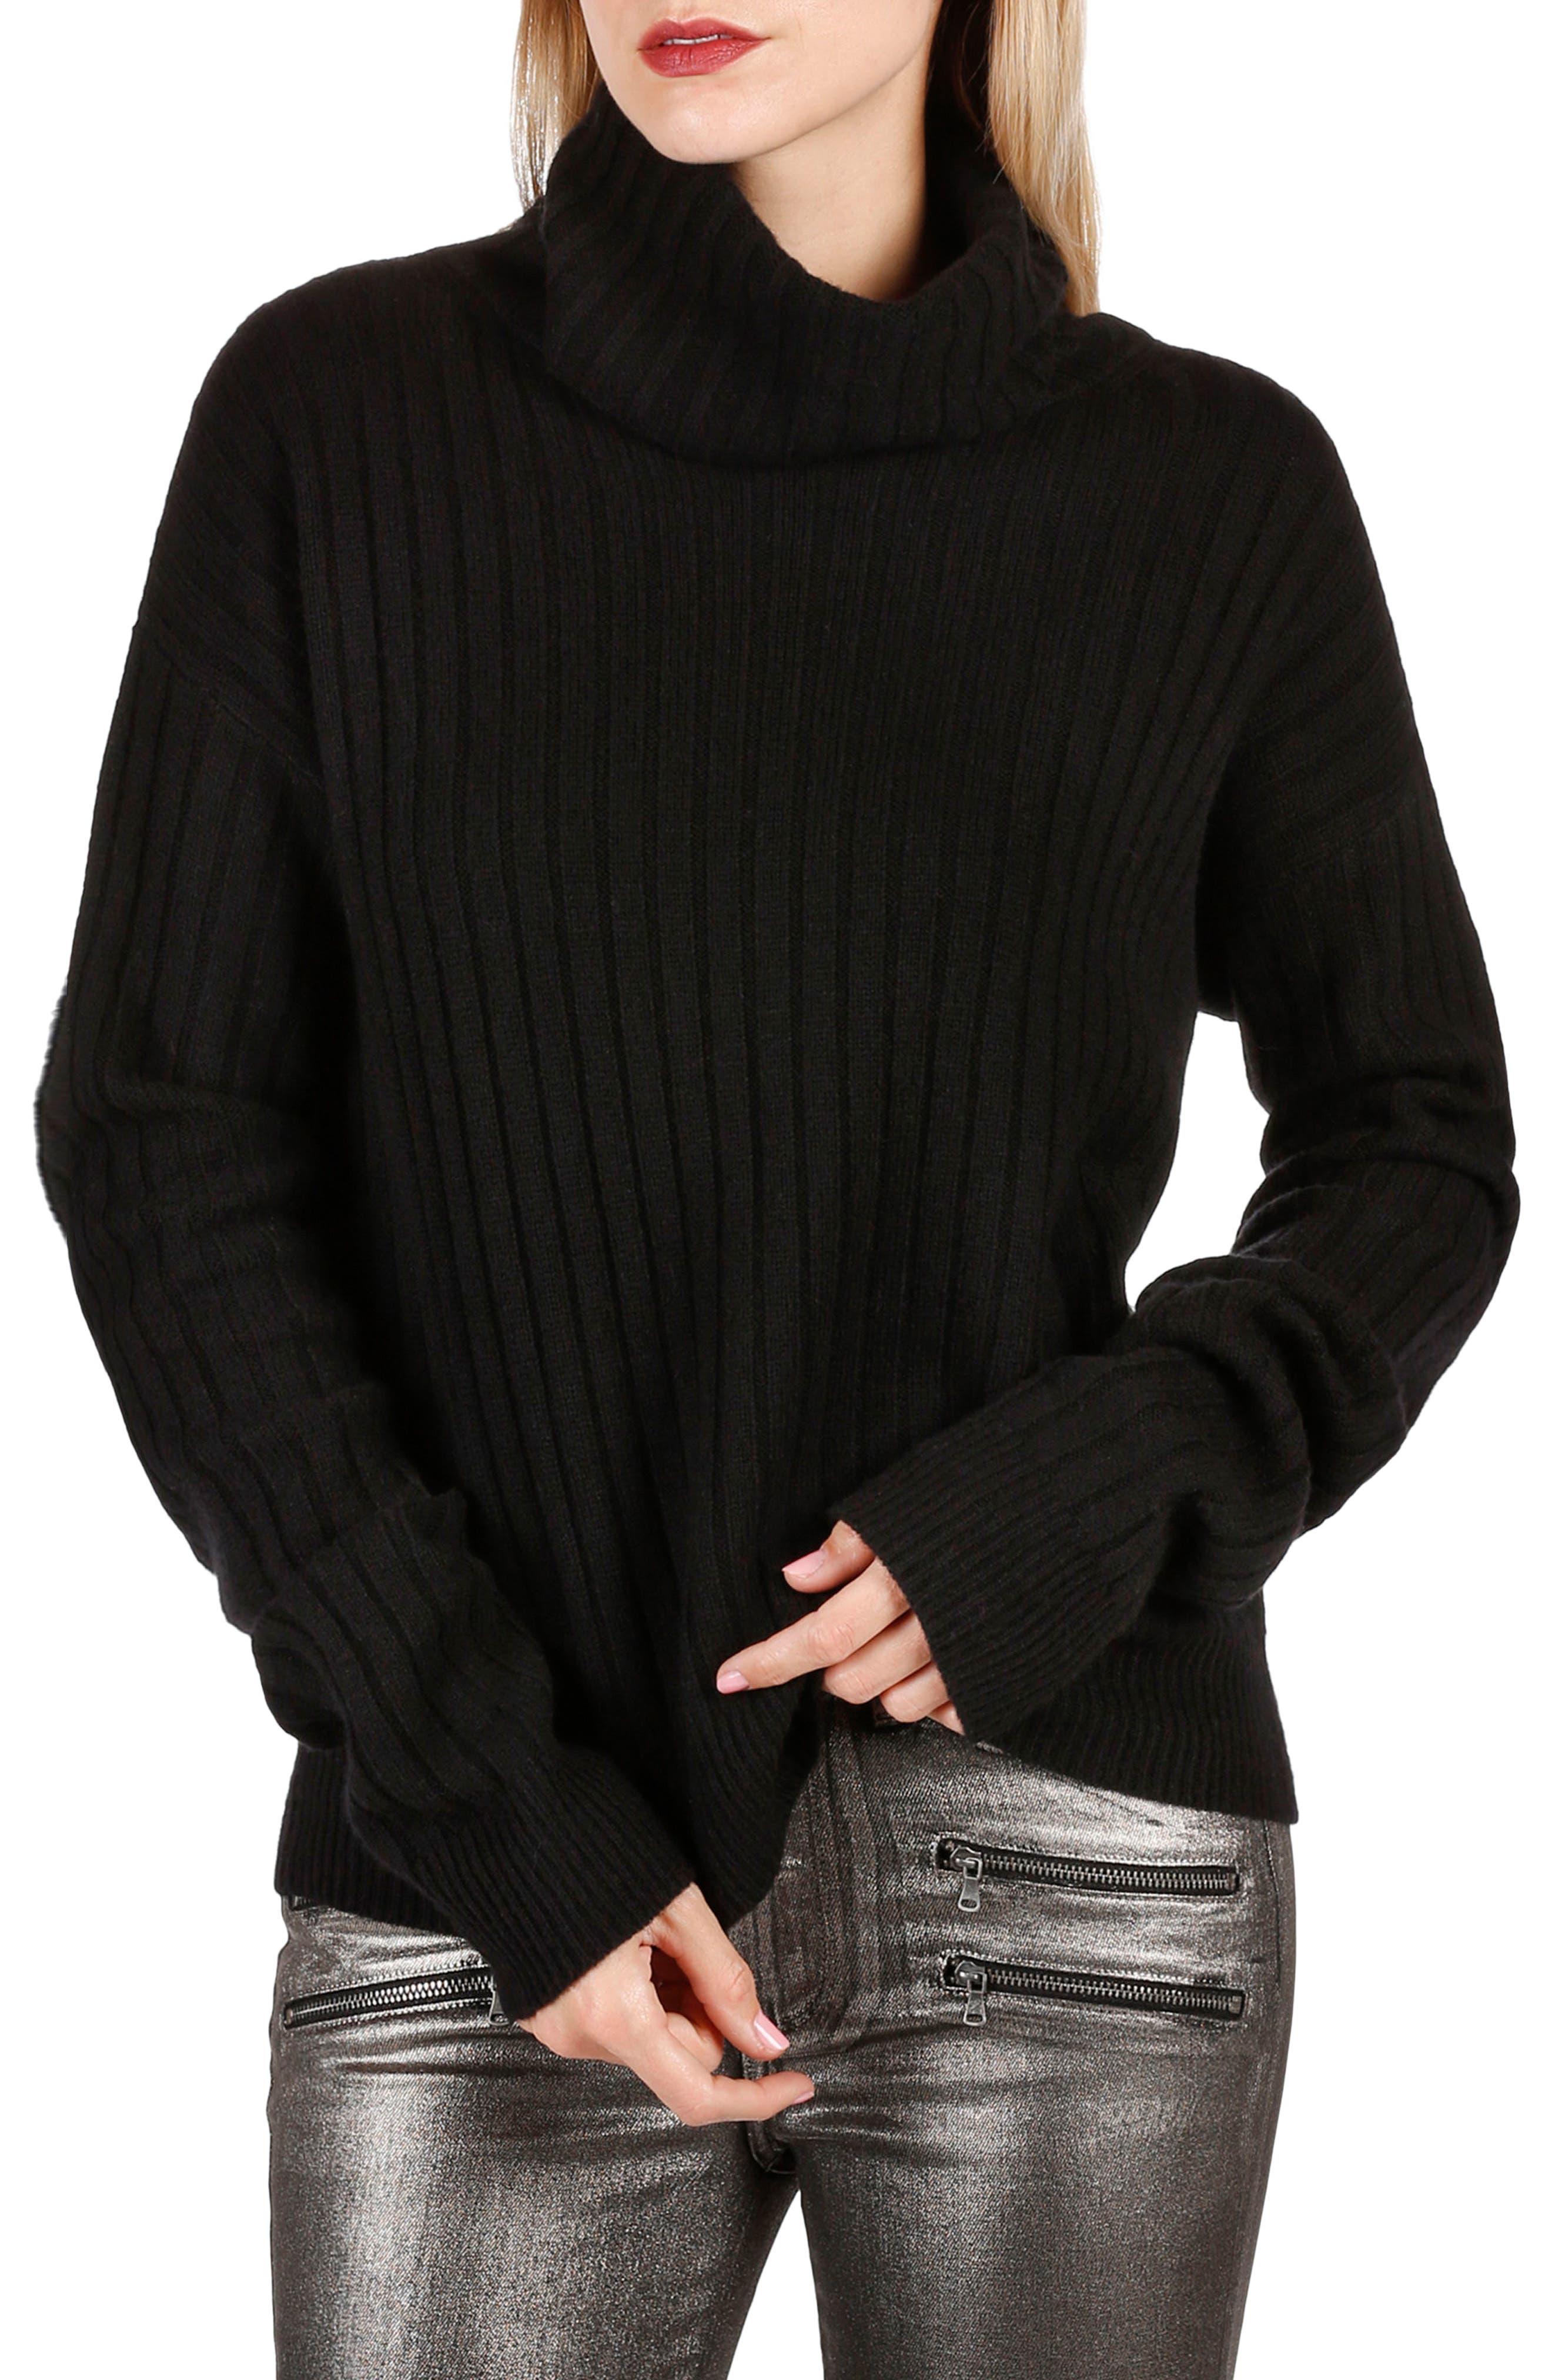 Rosie HW x PAIGE Mina Turtleneck Sweater